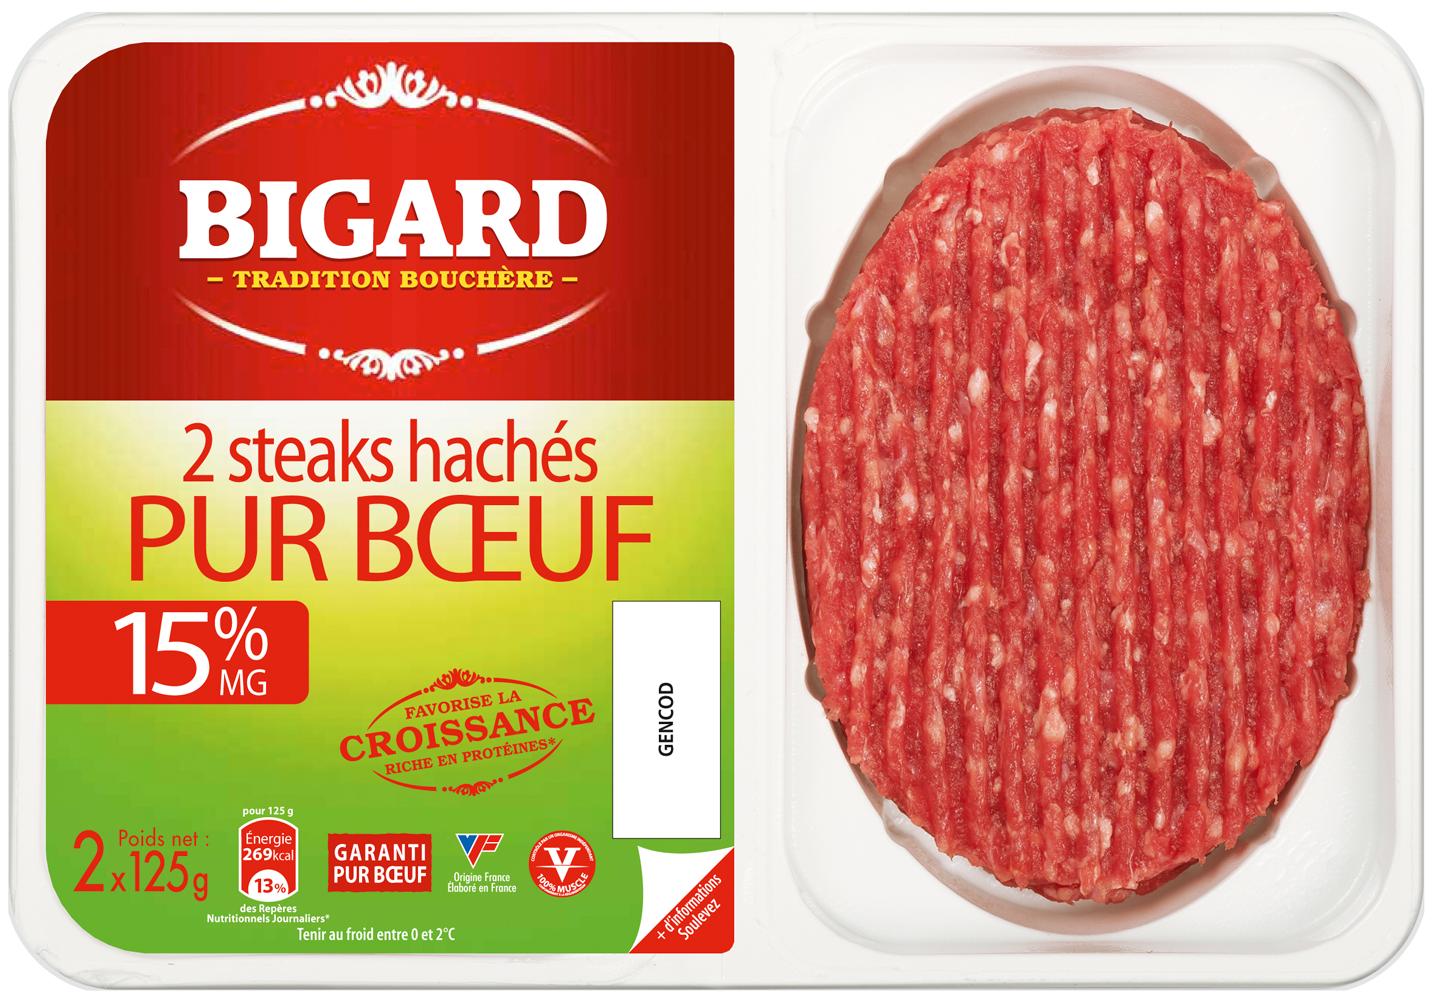 Populaire Steak haché Bigard | Bigard | Pinterest XU17